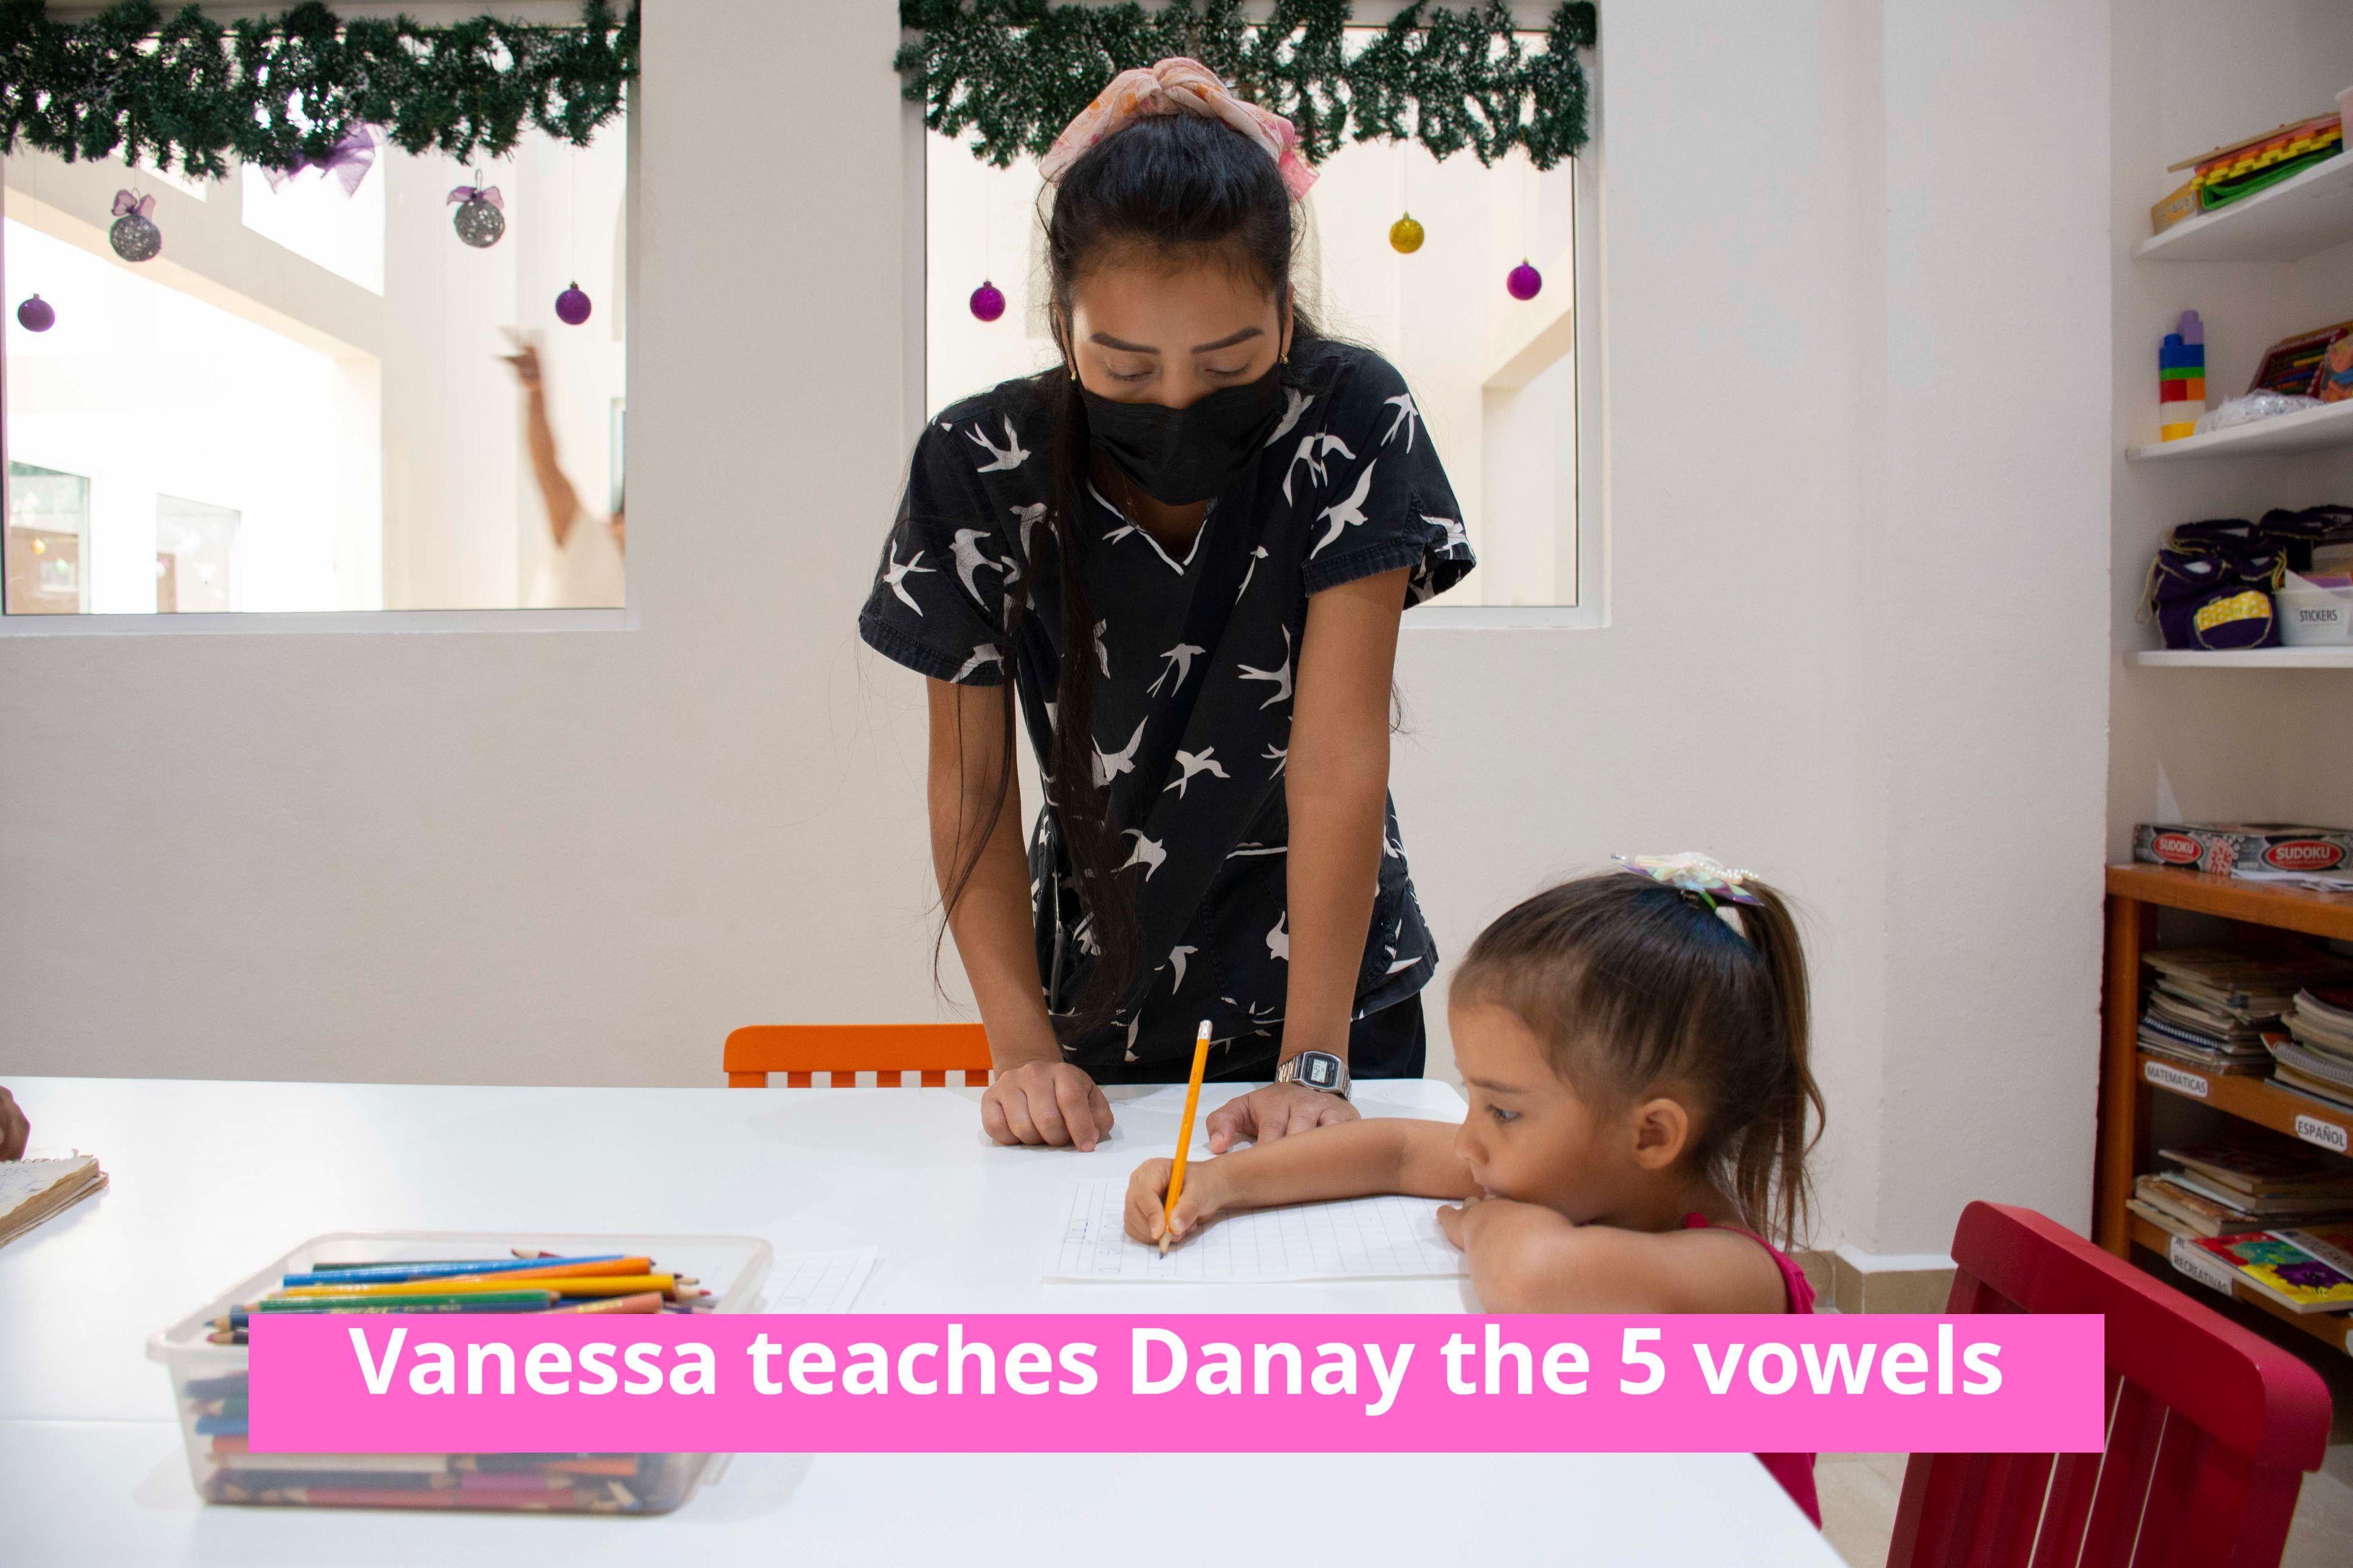 Vanessa teaches Danay the 5 vowels